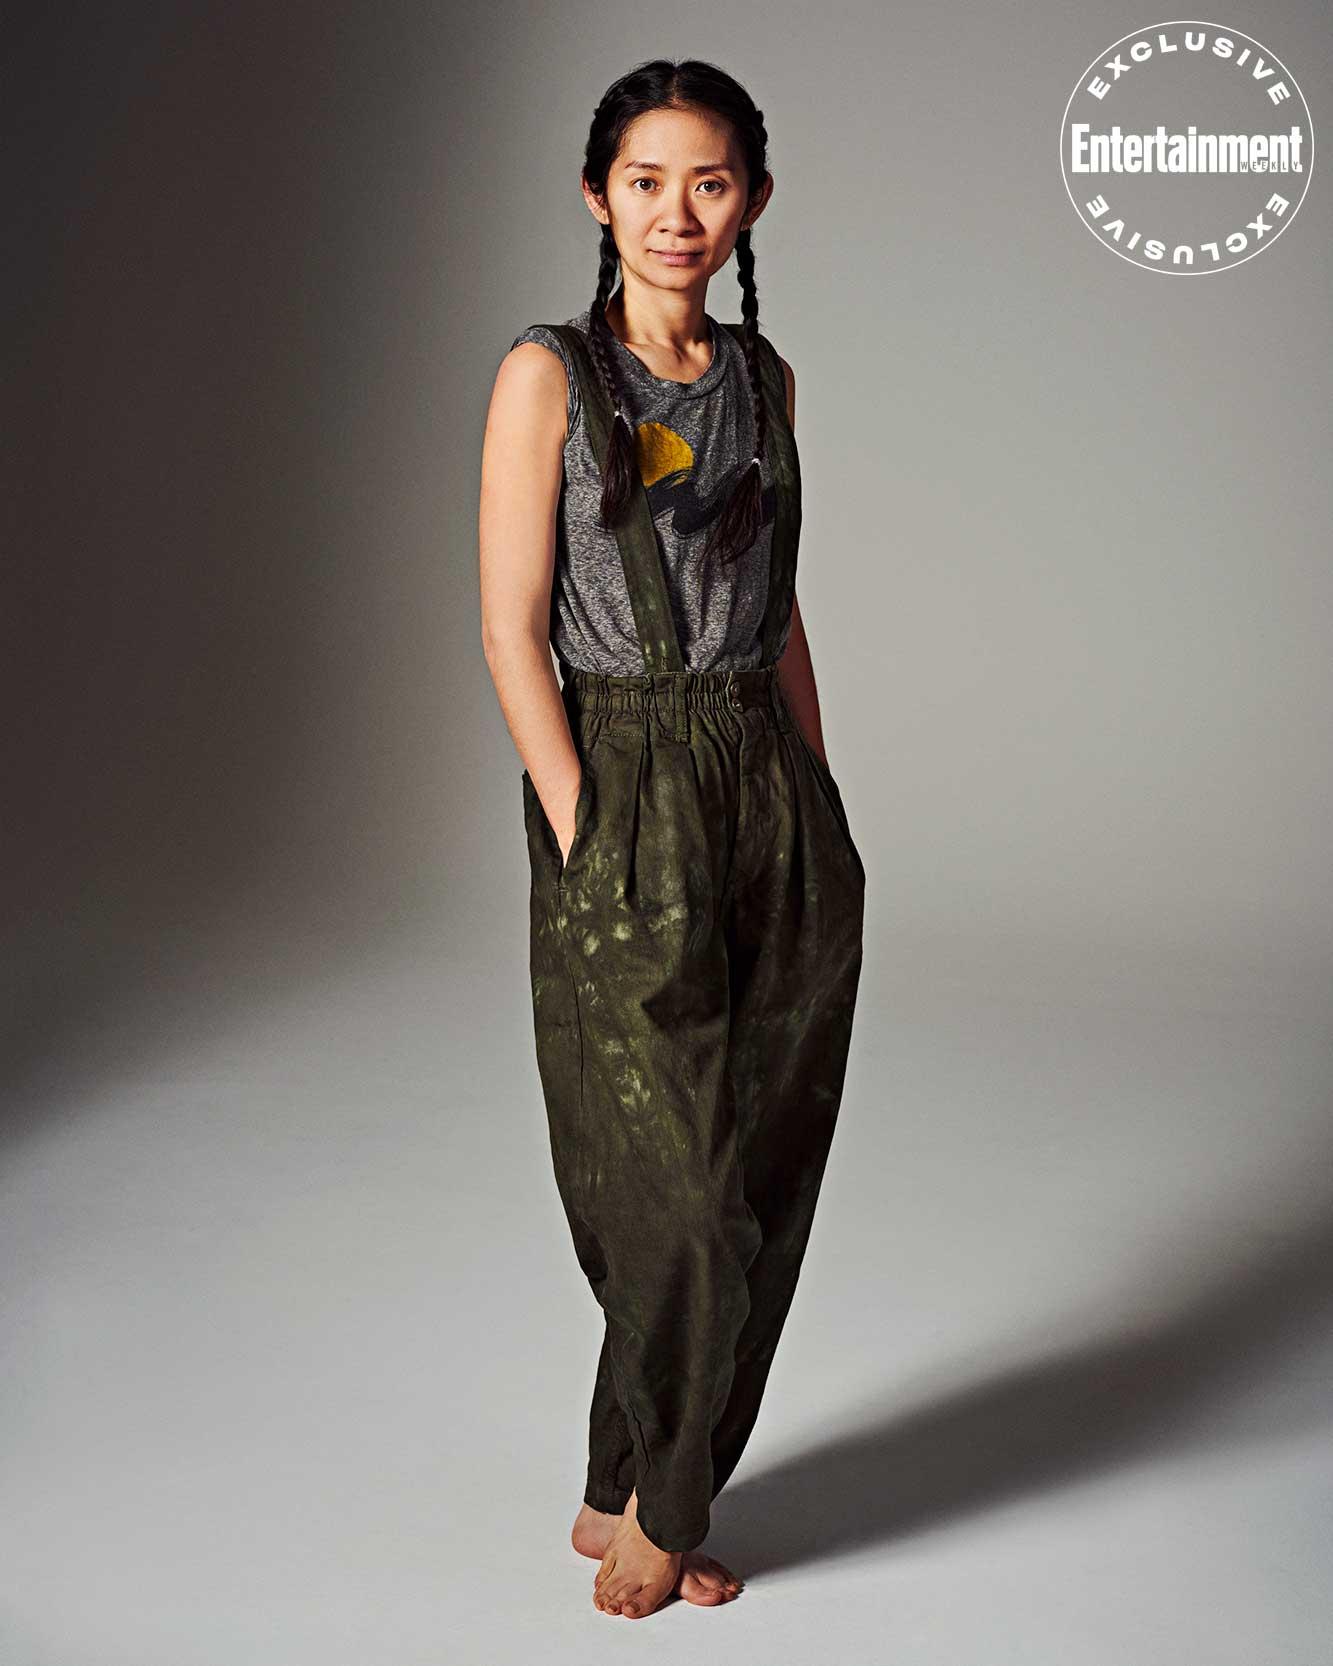 May 2021 Oscar Cover- Chloé Zhao